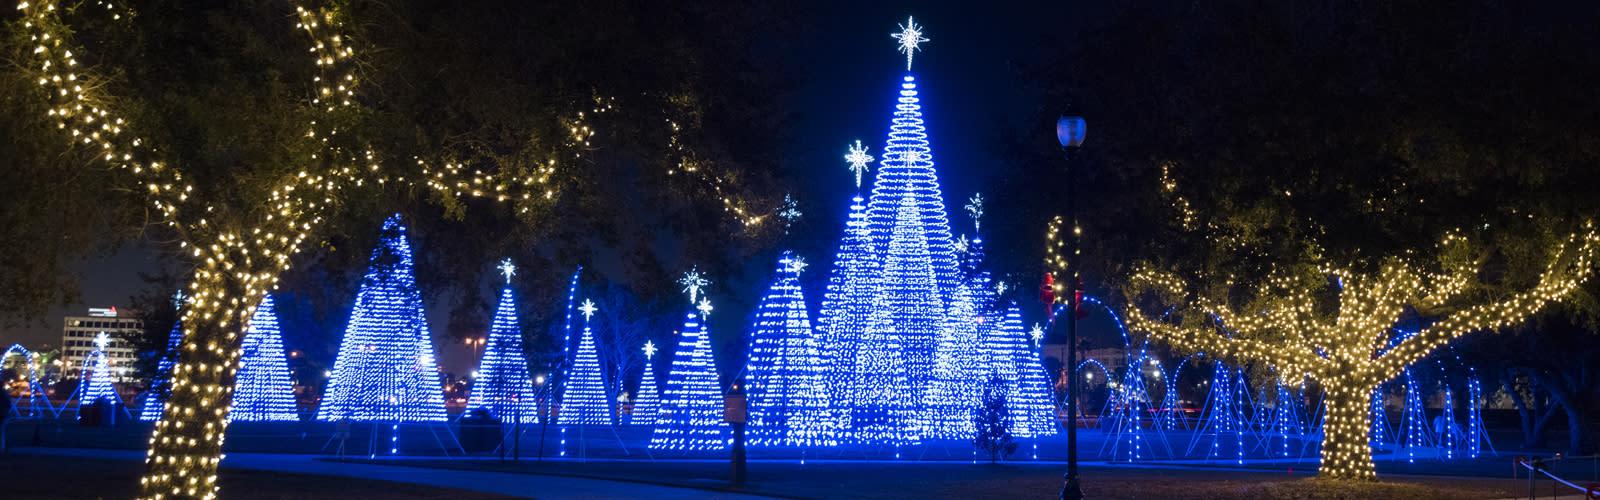 Coastal Christmas - Harbor Lights Festival